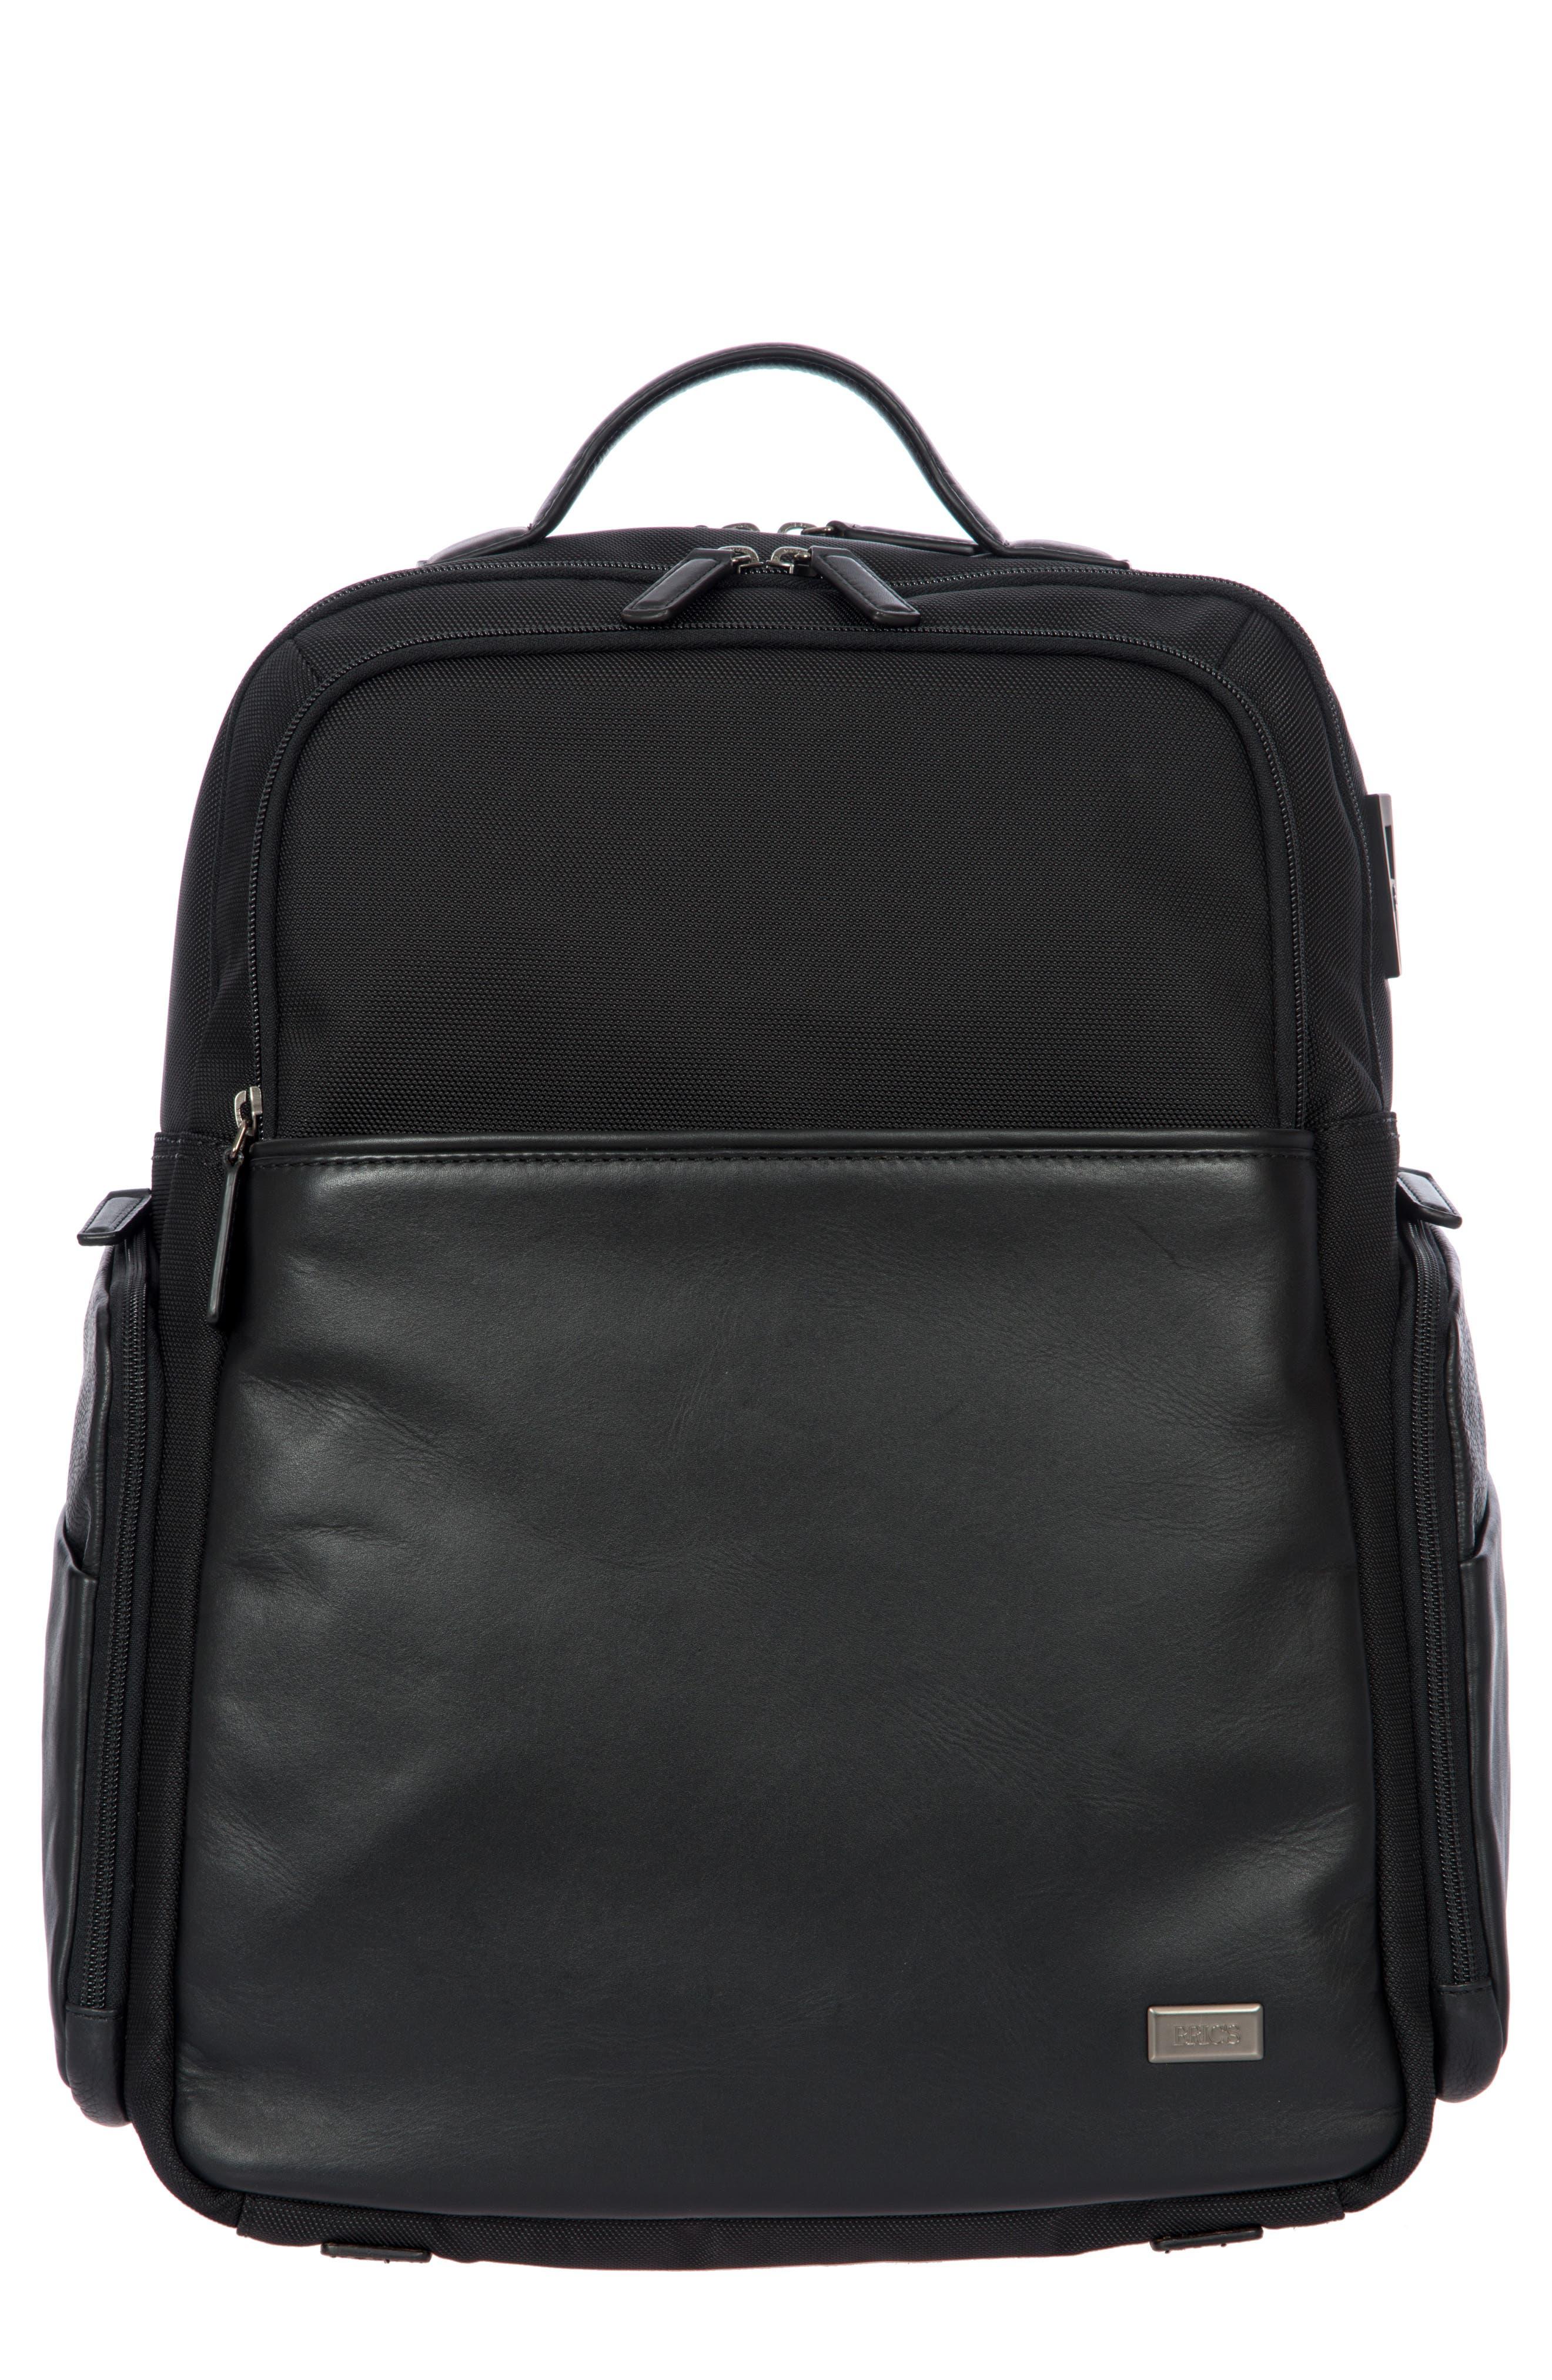 b2ae318ea61b Men's Bric's Bags & Backpacks   Nordstrom